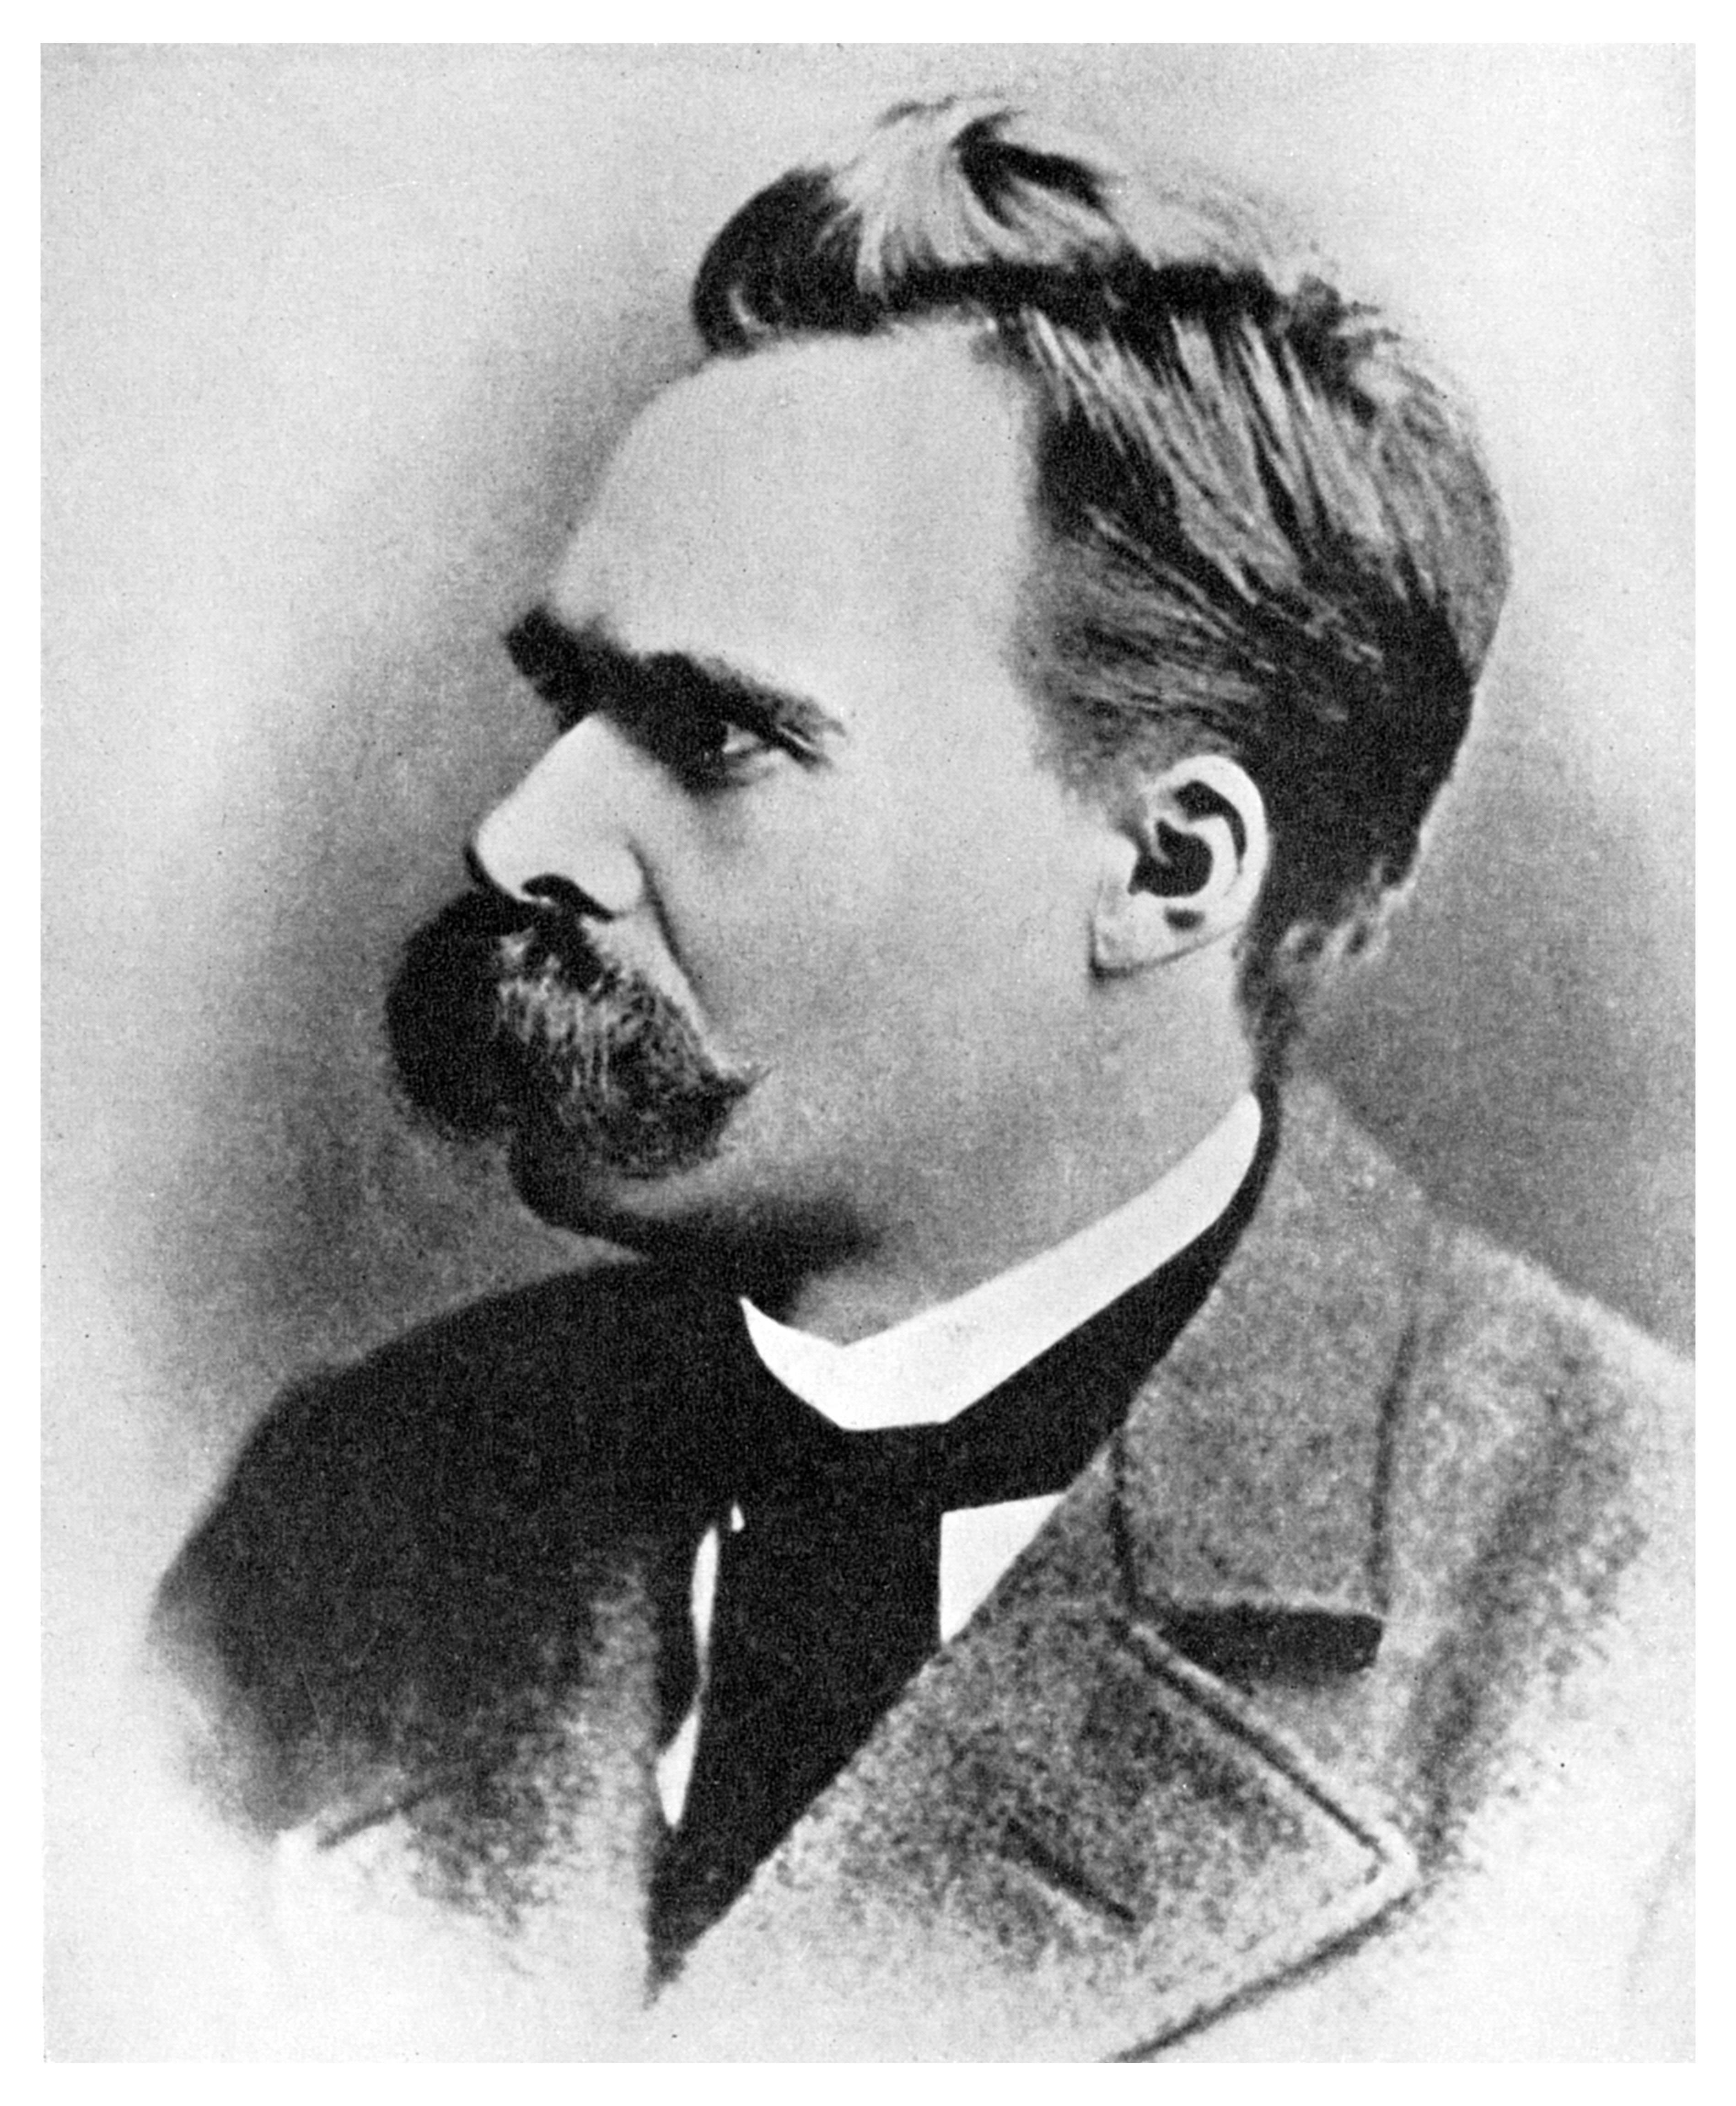 'Superman': Friedrich Nietzsche, German philosopher, 19th century (1956). Nietzsche (1844-1900) put forward the idea of the �